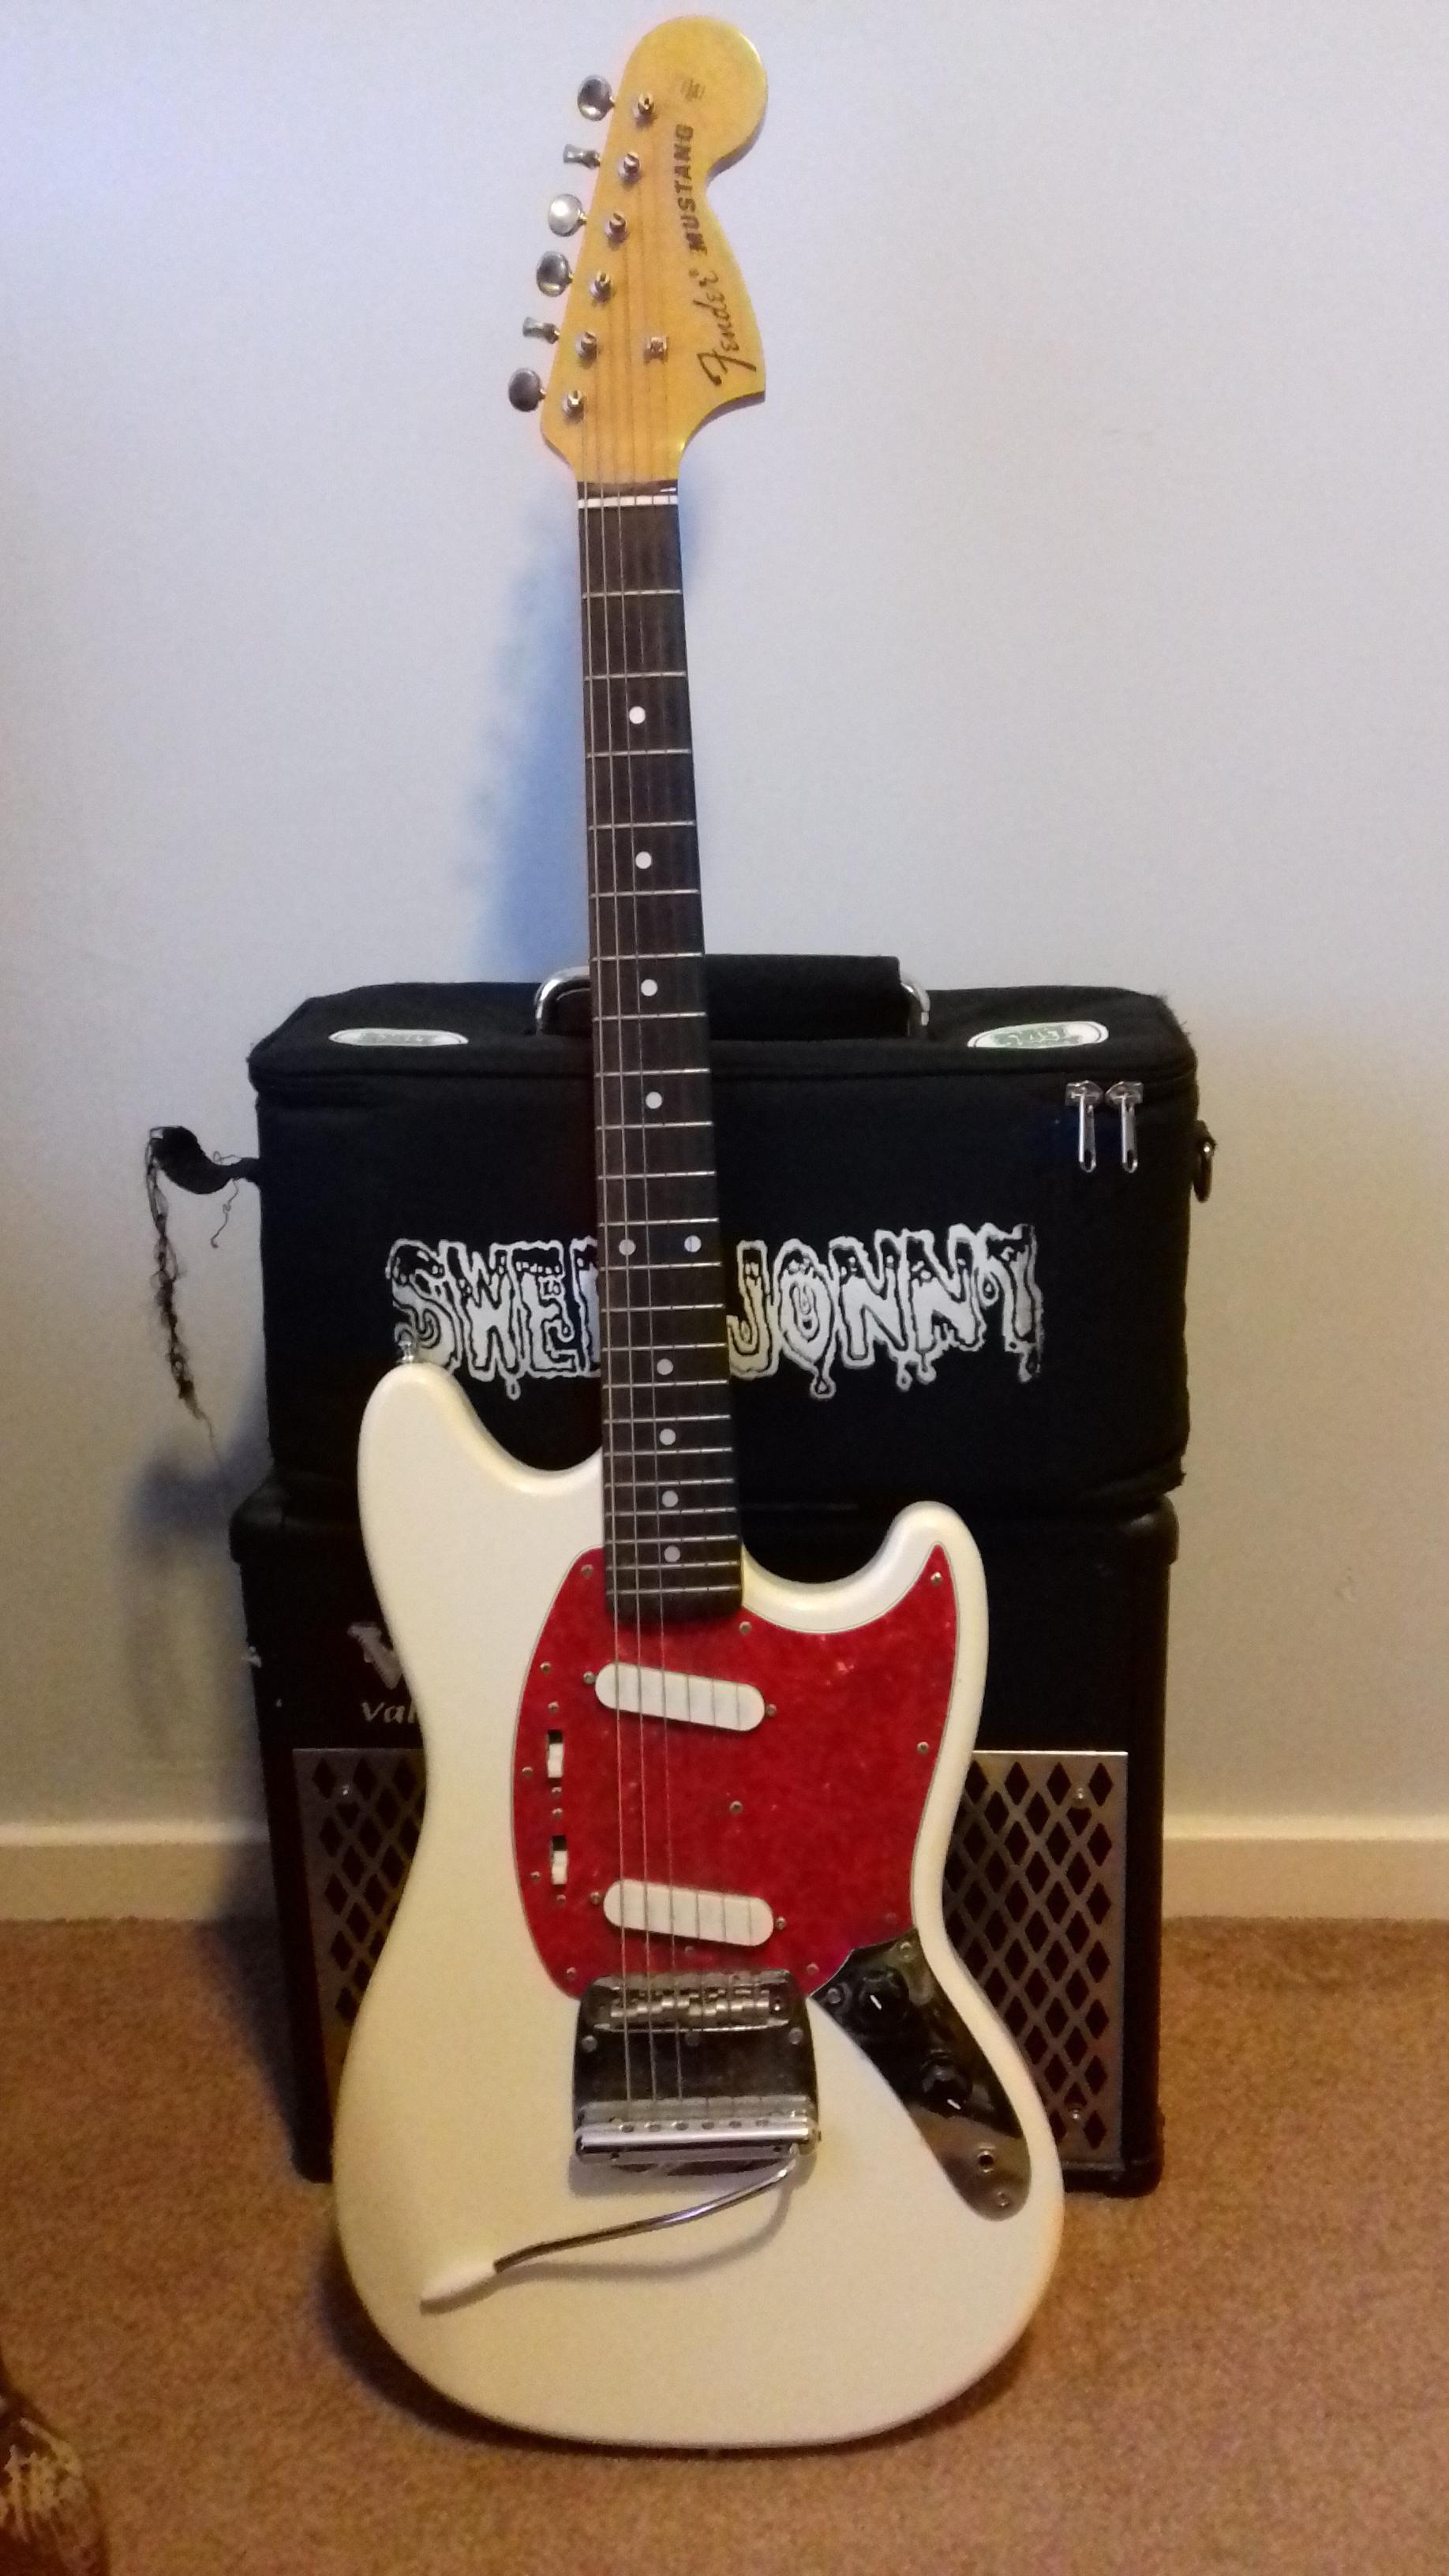 gifts for musicians reddit